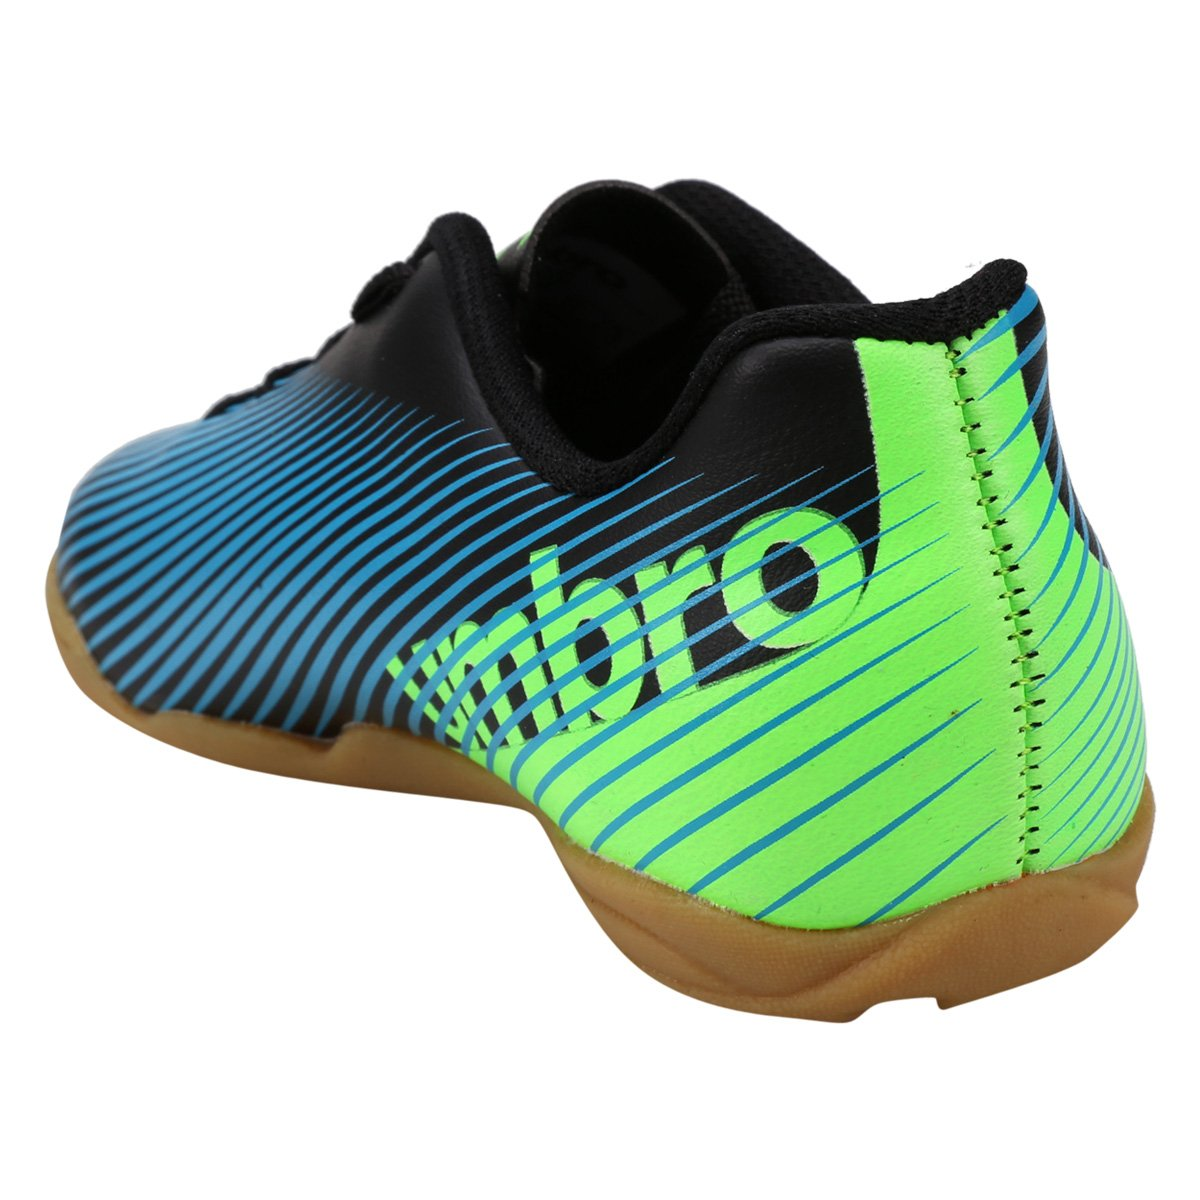 Chuteira Futsal Infantil Umbro Speed II - Compre Agora  9b453fd0521f8